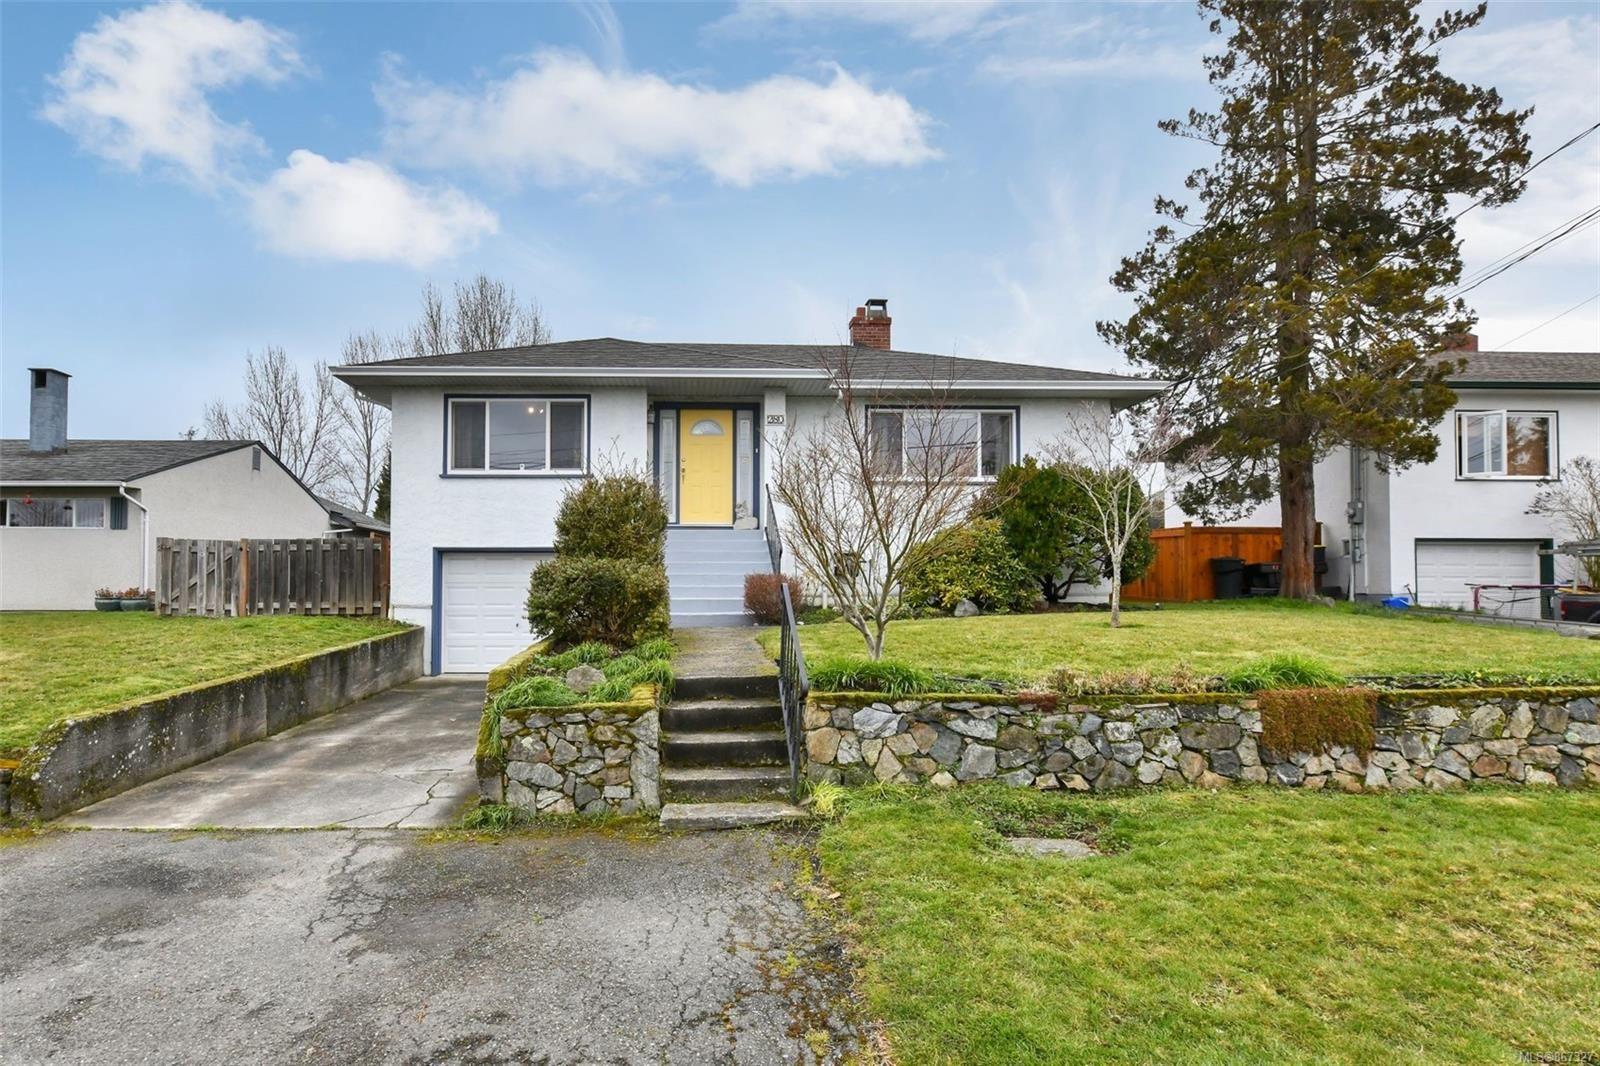 Main Photo: 280 Nicola Pl in : SW Tillicum House for sale (Saanich West)  : MLS®# 867327